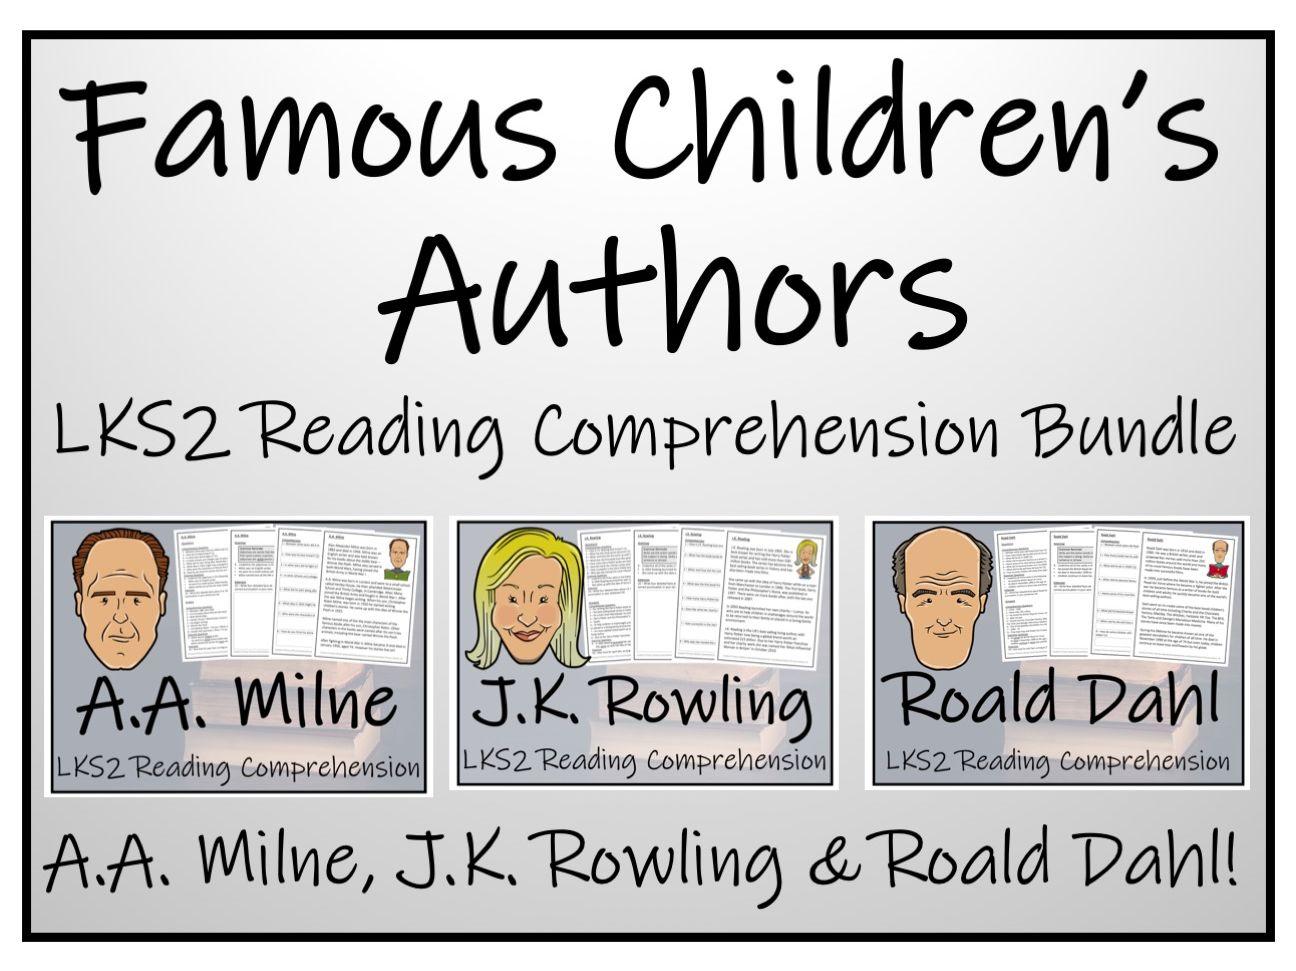 LKS2 - Greatest Children's Author Reading Comprehension Bundle